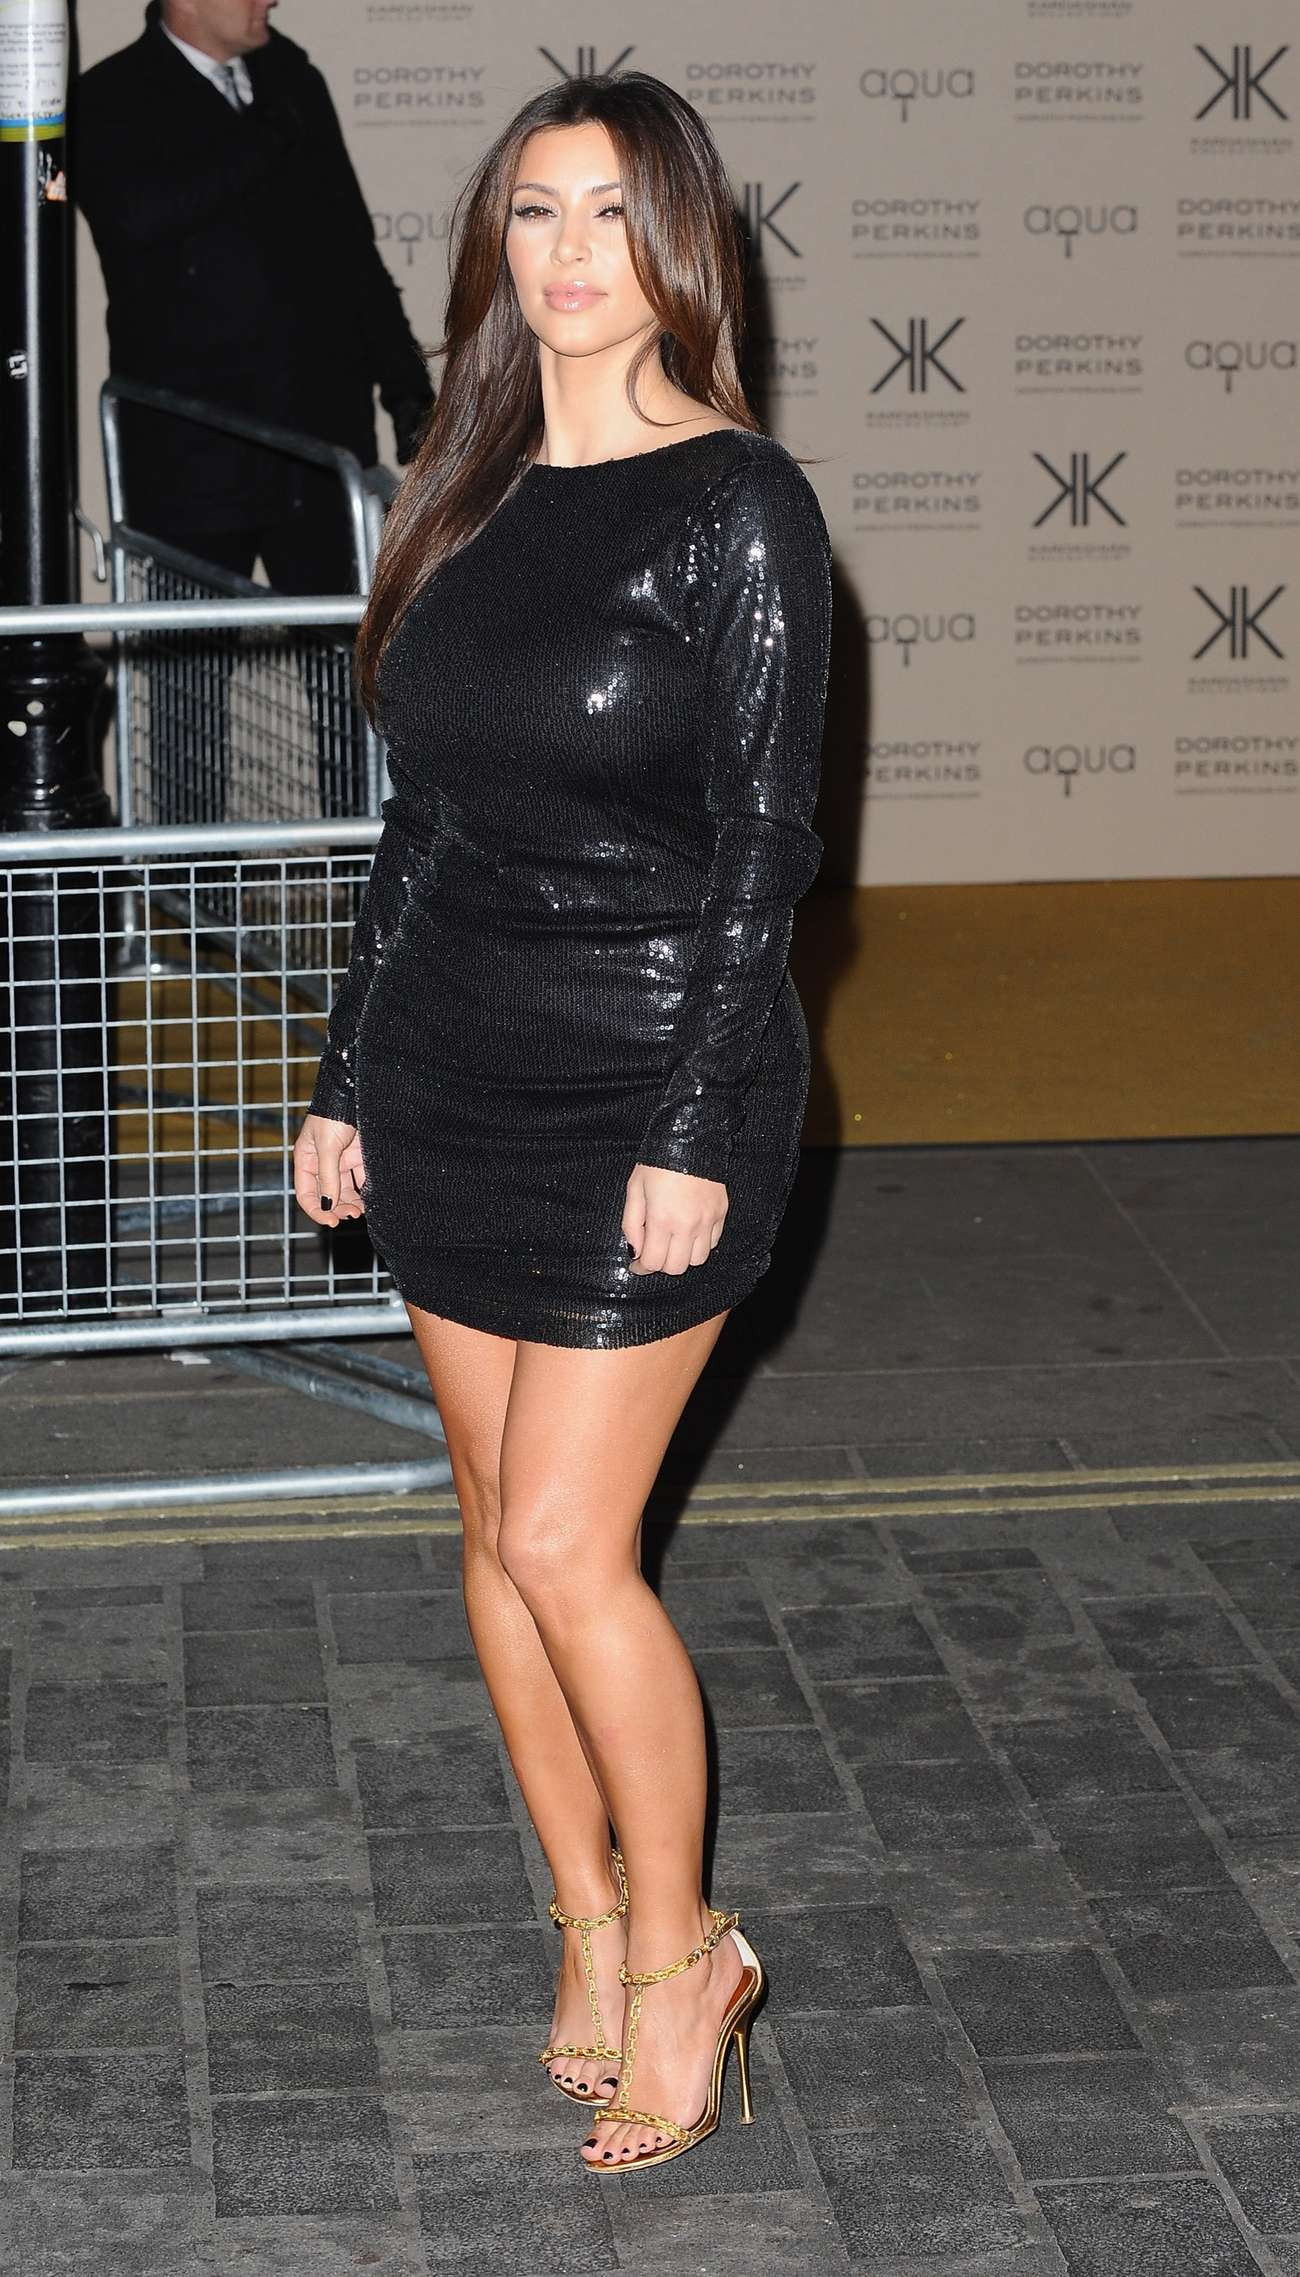 Kim Kardashian Kollection Clothing In London 01 Gotceleb